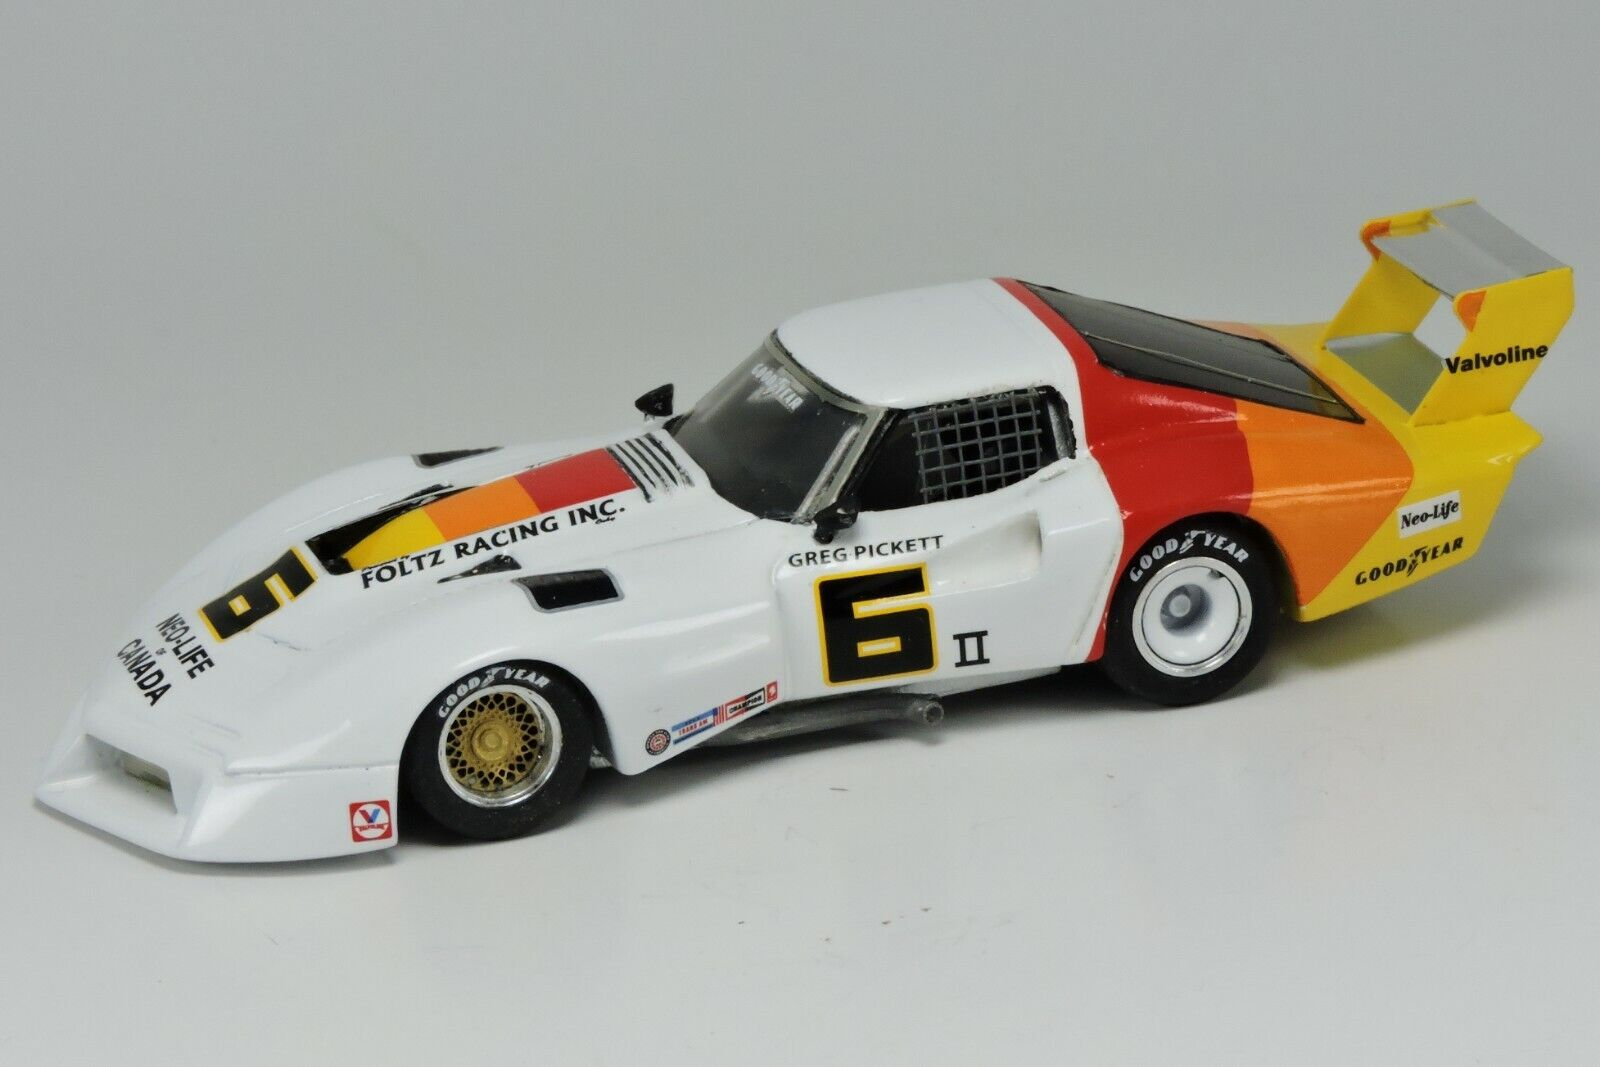 suministro de productos de calidad kit Corvette Corvette Corvette C3 Tubular Frame  6 Westwood 1978 - Arena Models kit 1 43  selección larga